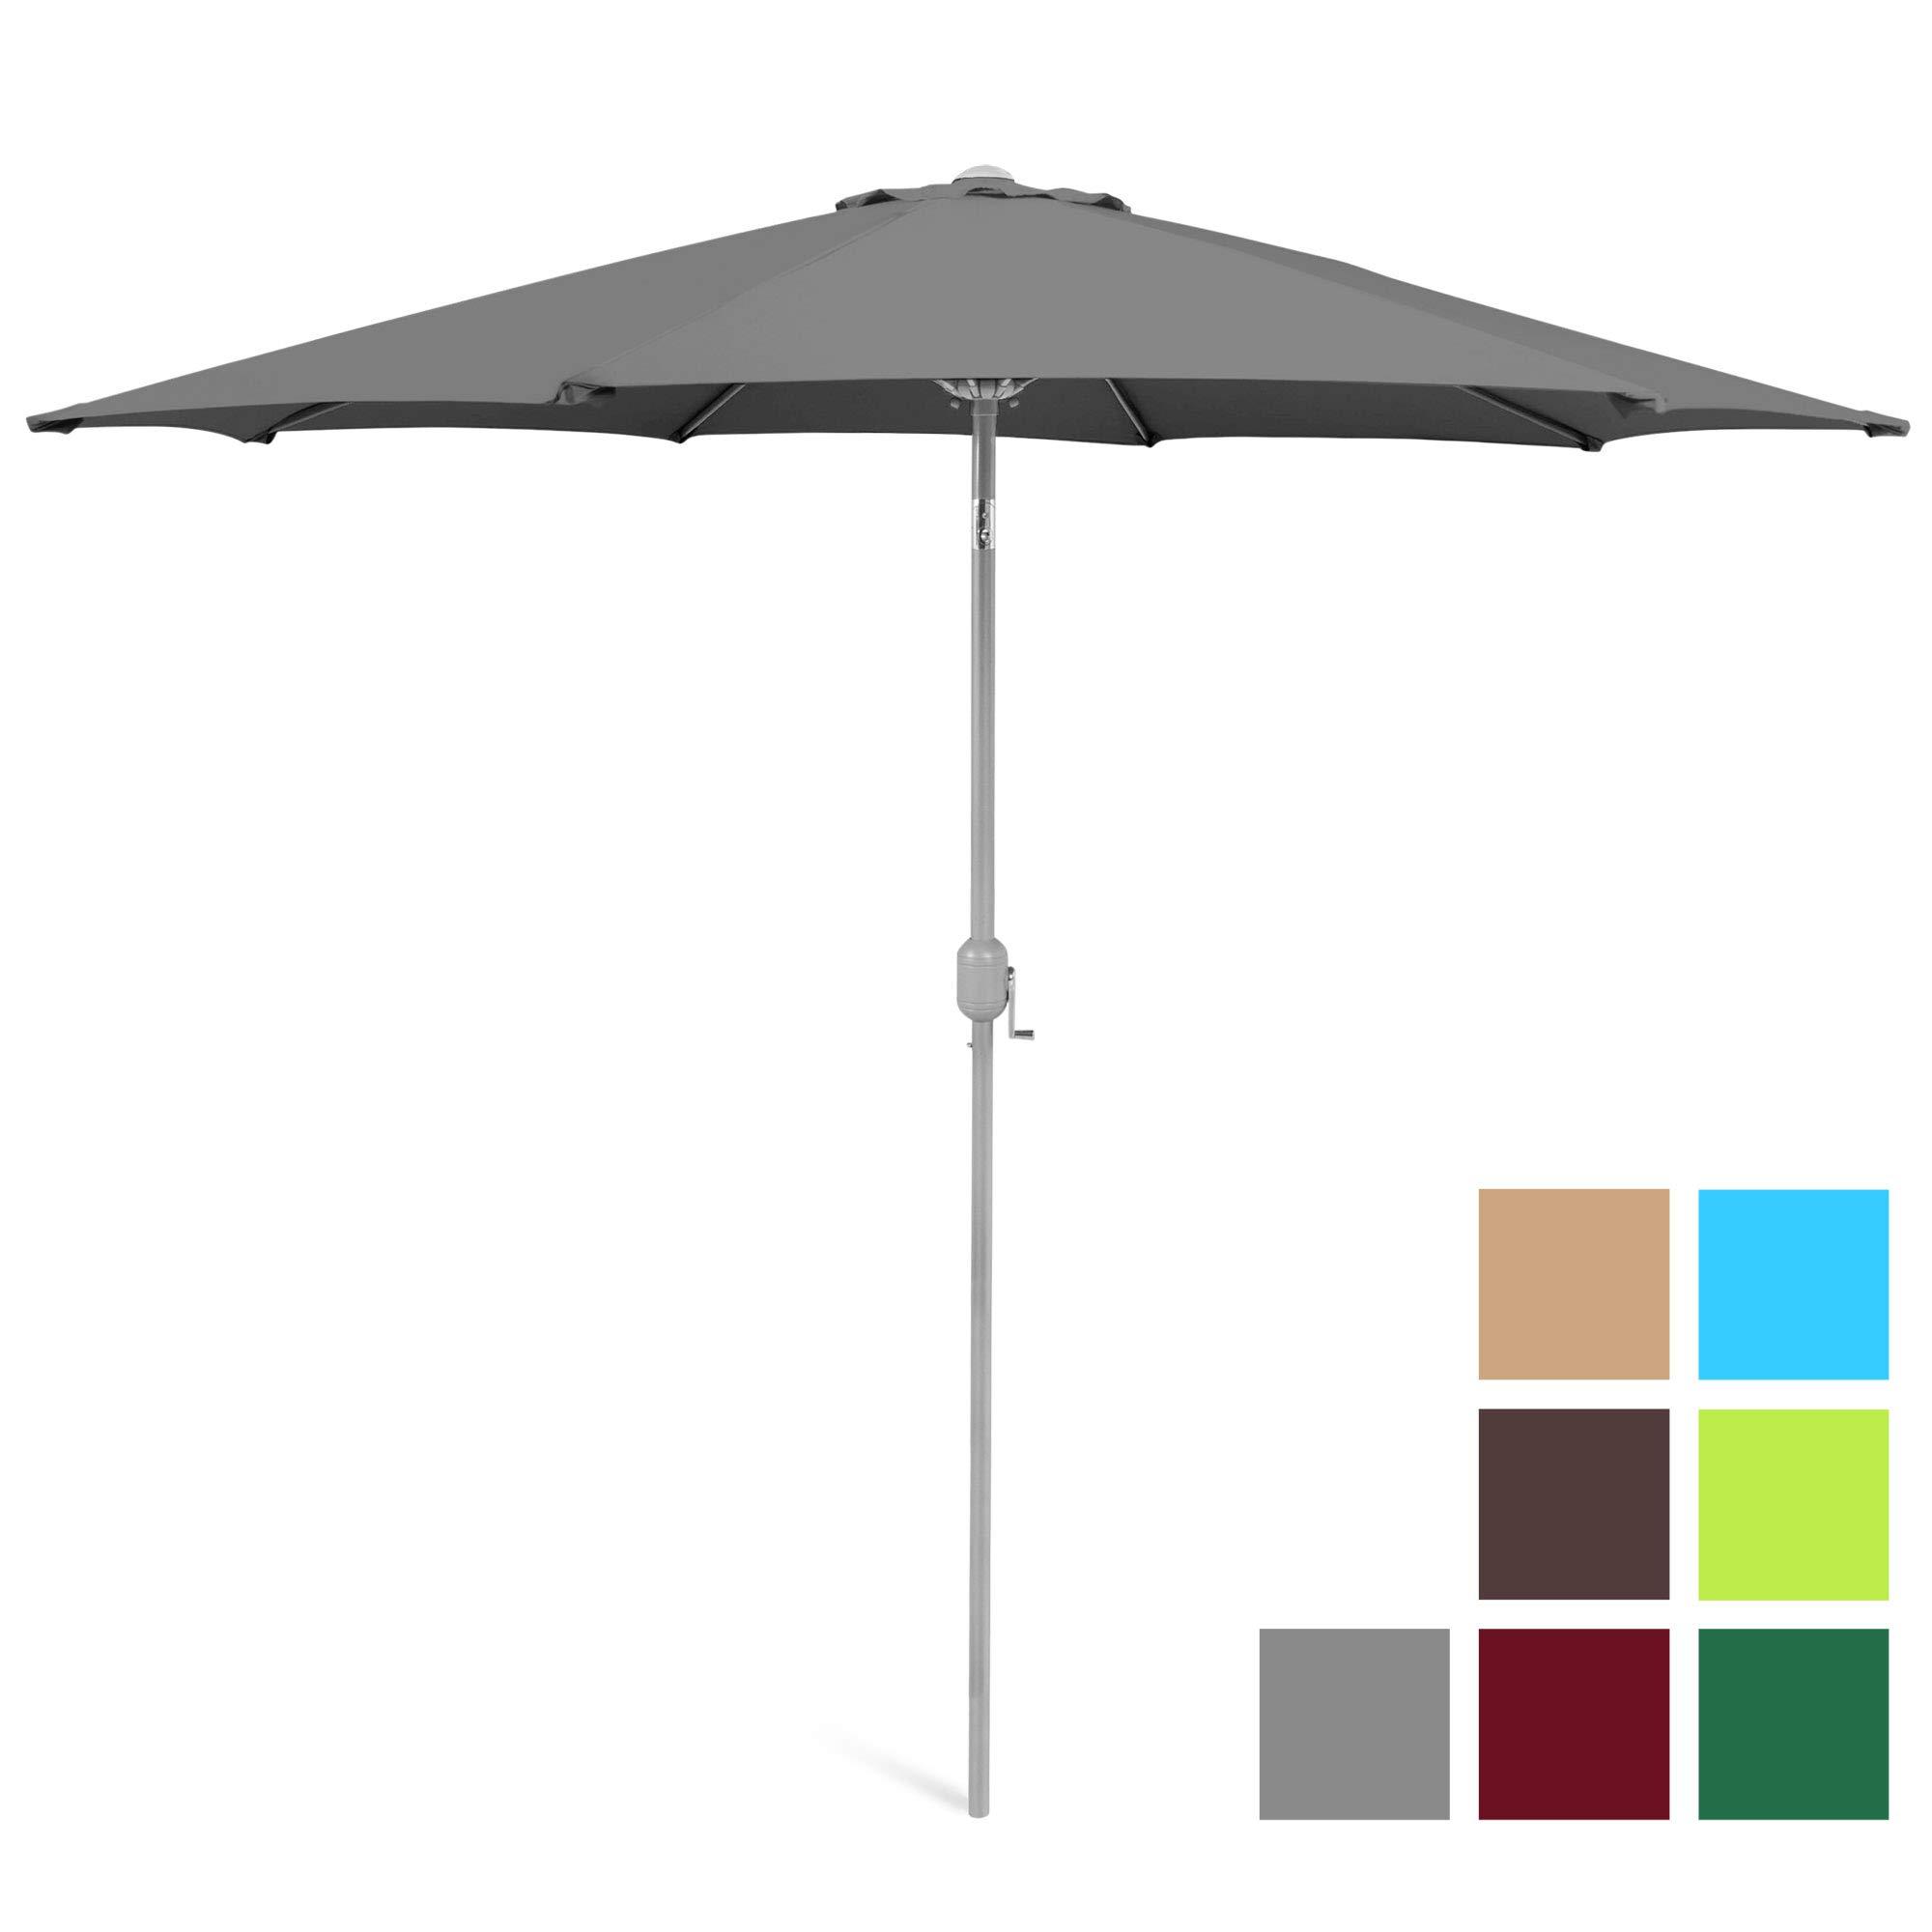 Best Choice Products 9ft Outdoor Water/UV-Resistant Market Patio Umbrella w/Crank Tilt Adjustment, 180G Polyester, Wind Vent, 1.5in Diameter Aluminum Pole - Gray